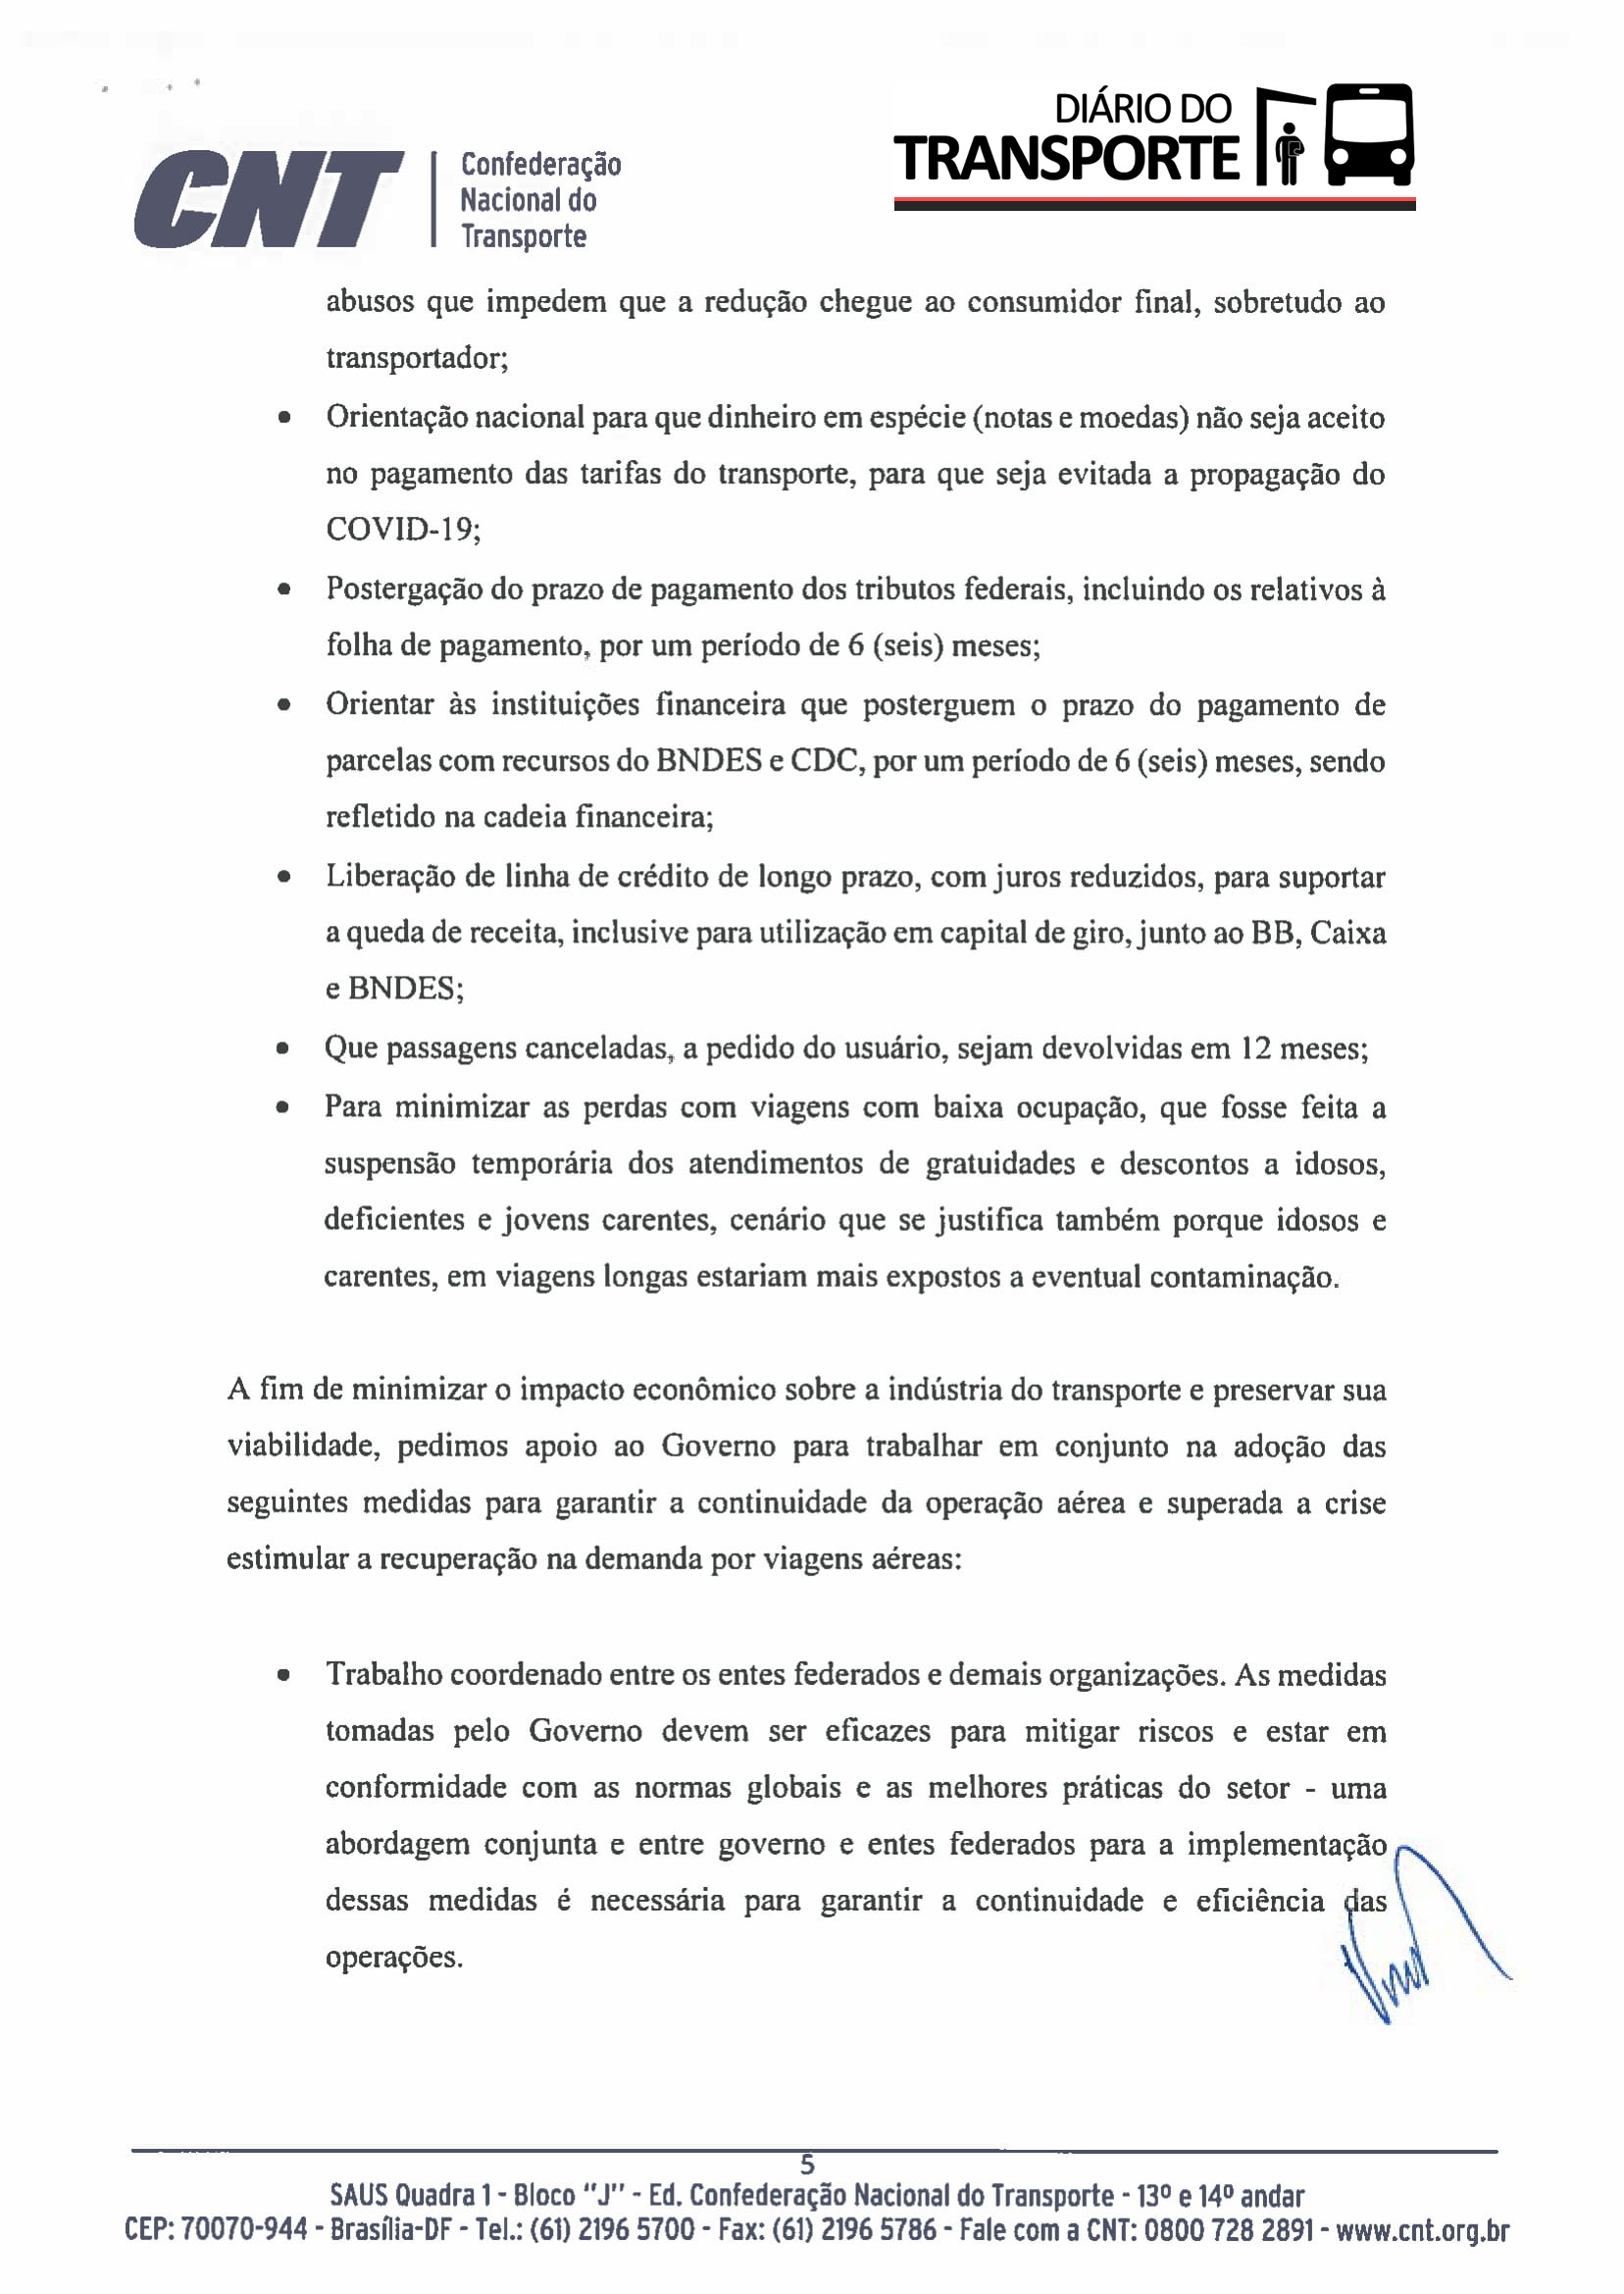 OF. CNT PRE N 054_2020.pdf-5